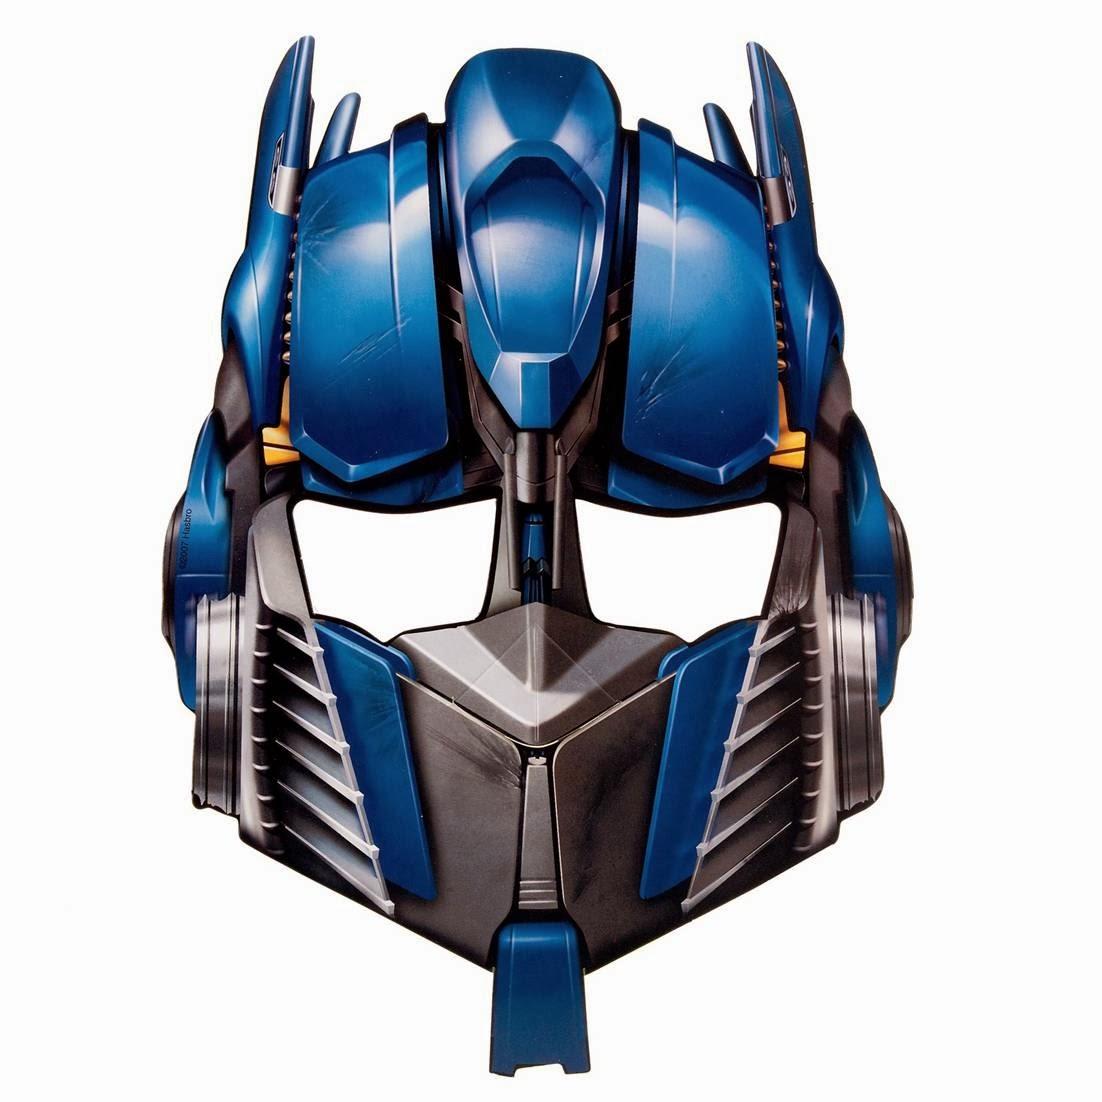 Transformers Free Printable Masks